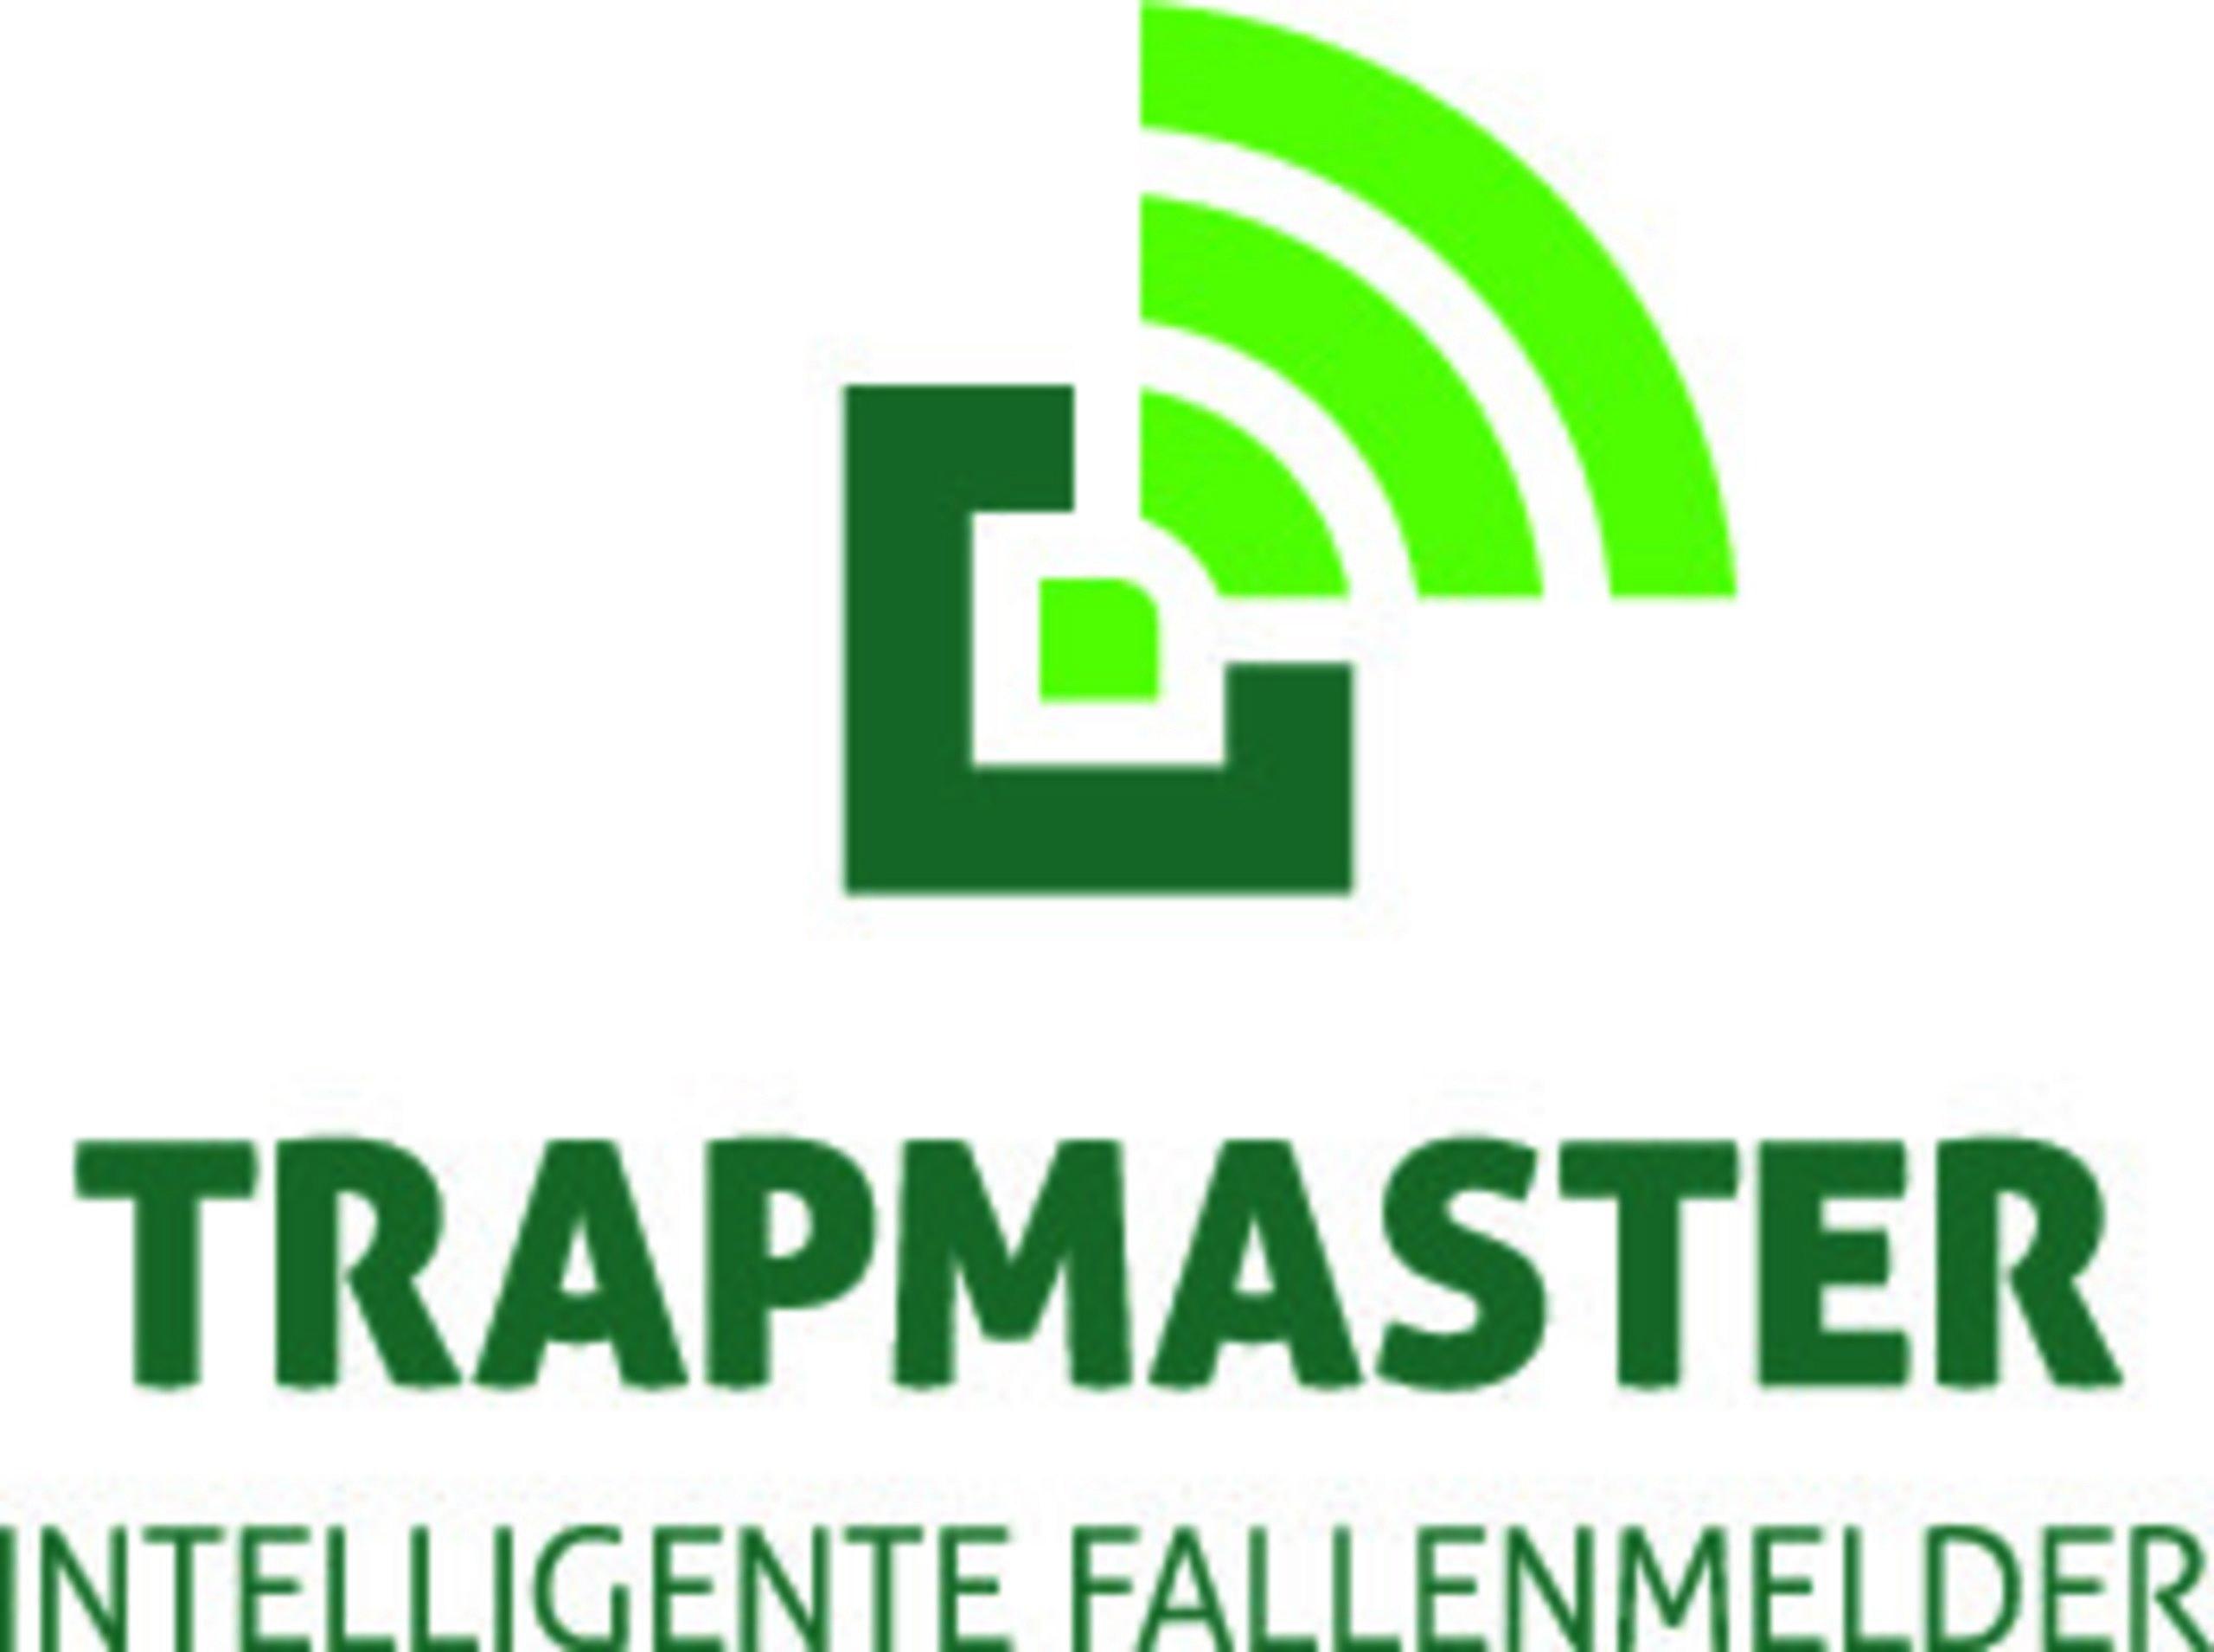 Trapmaster Fallenmelder